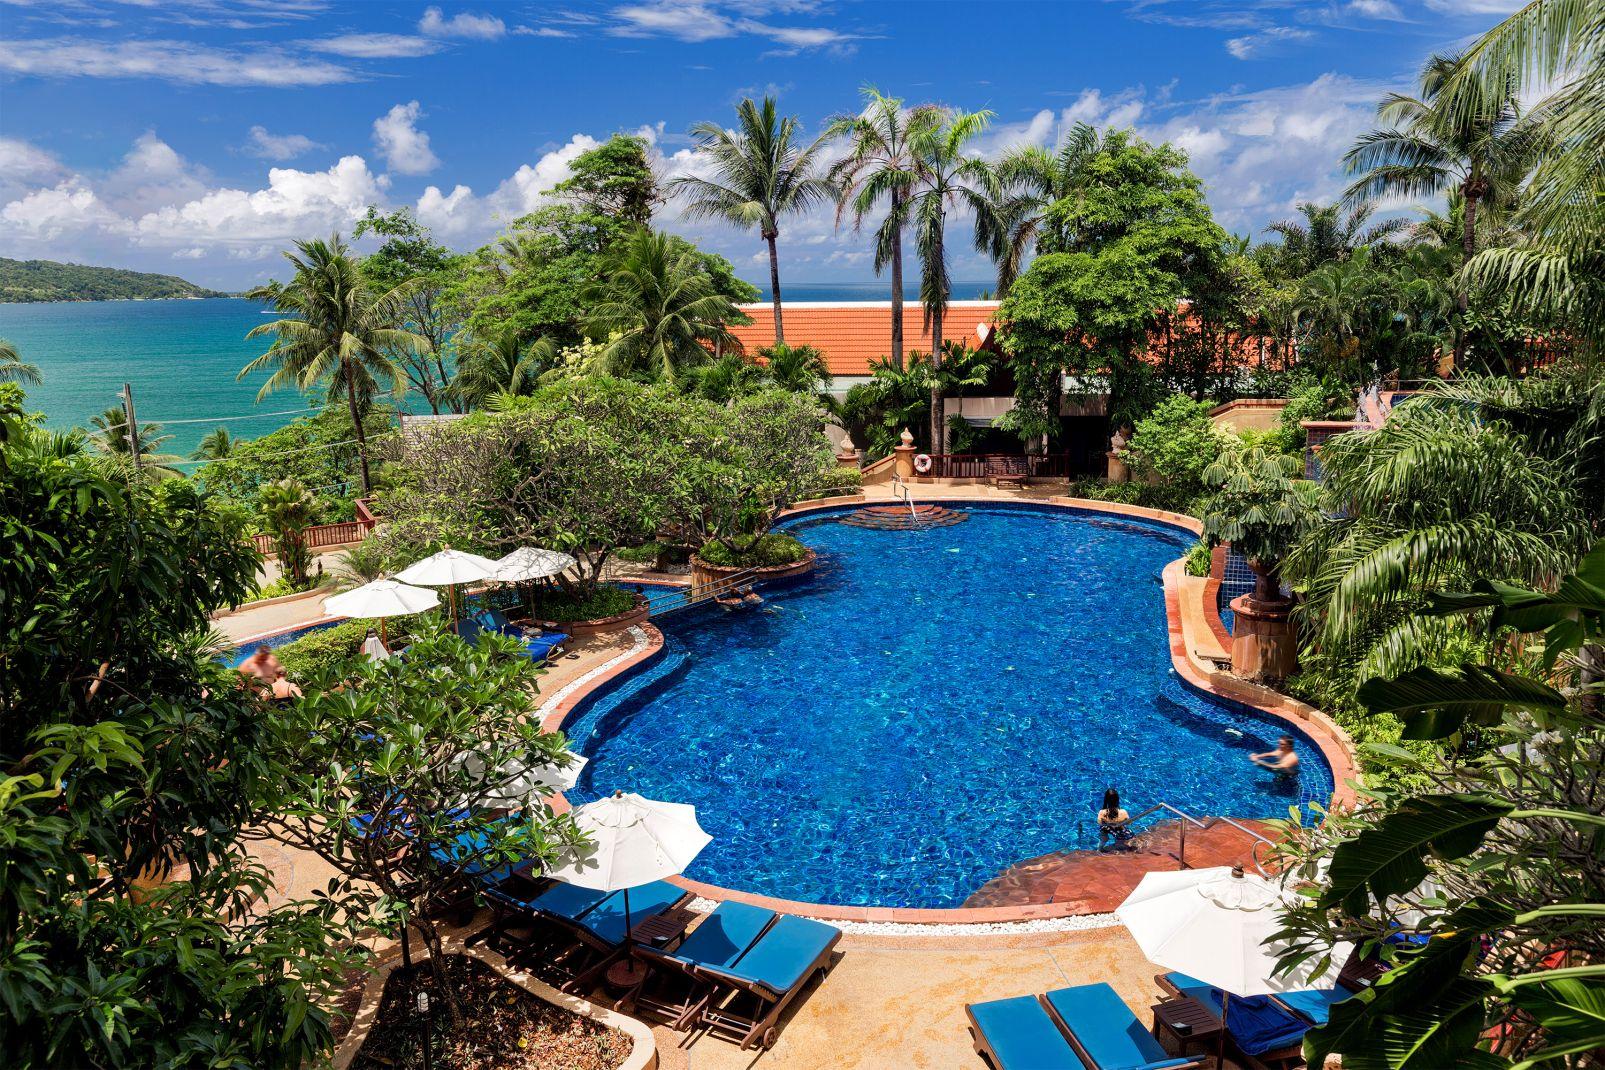 Séjour Vol + Hôtel Novotel Phuket Resort 4* plage de Patong - 1